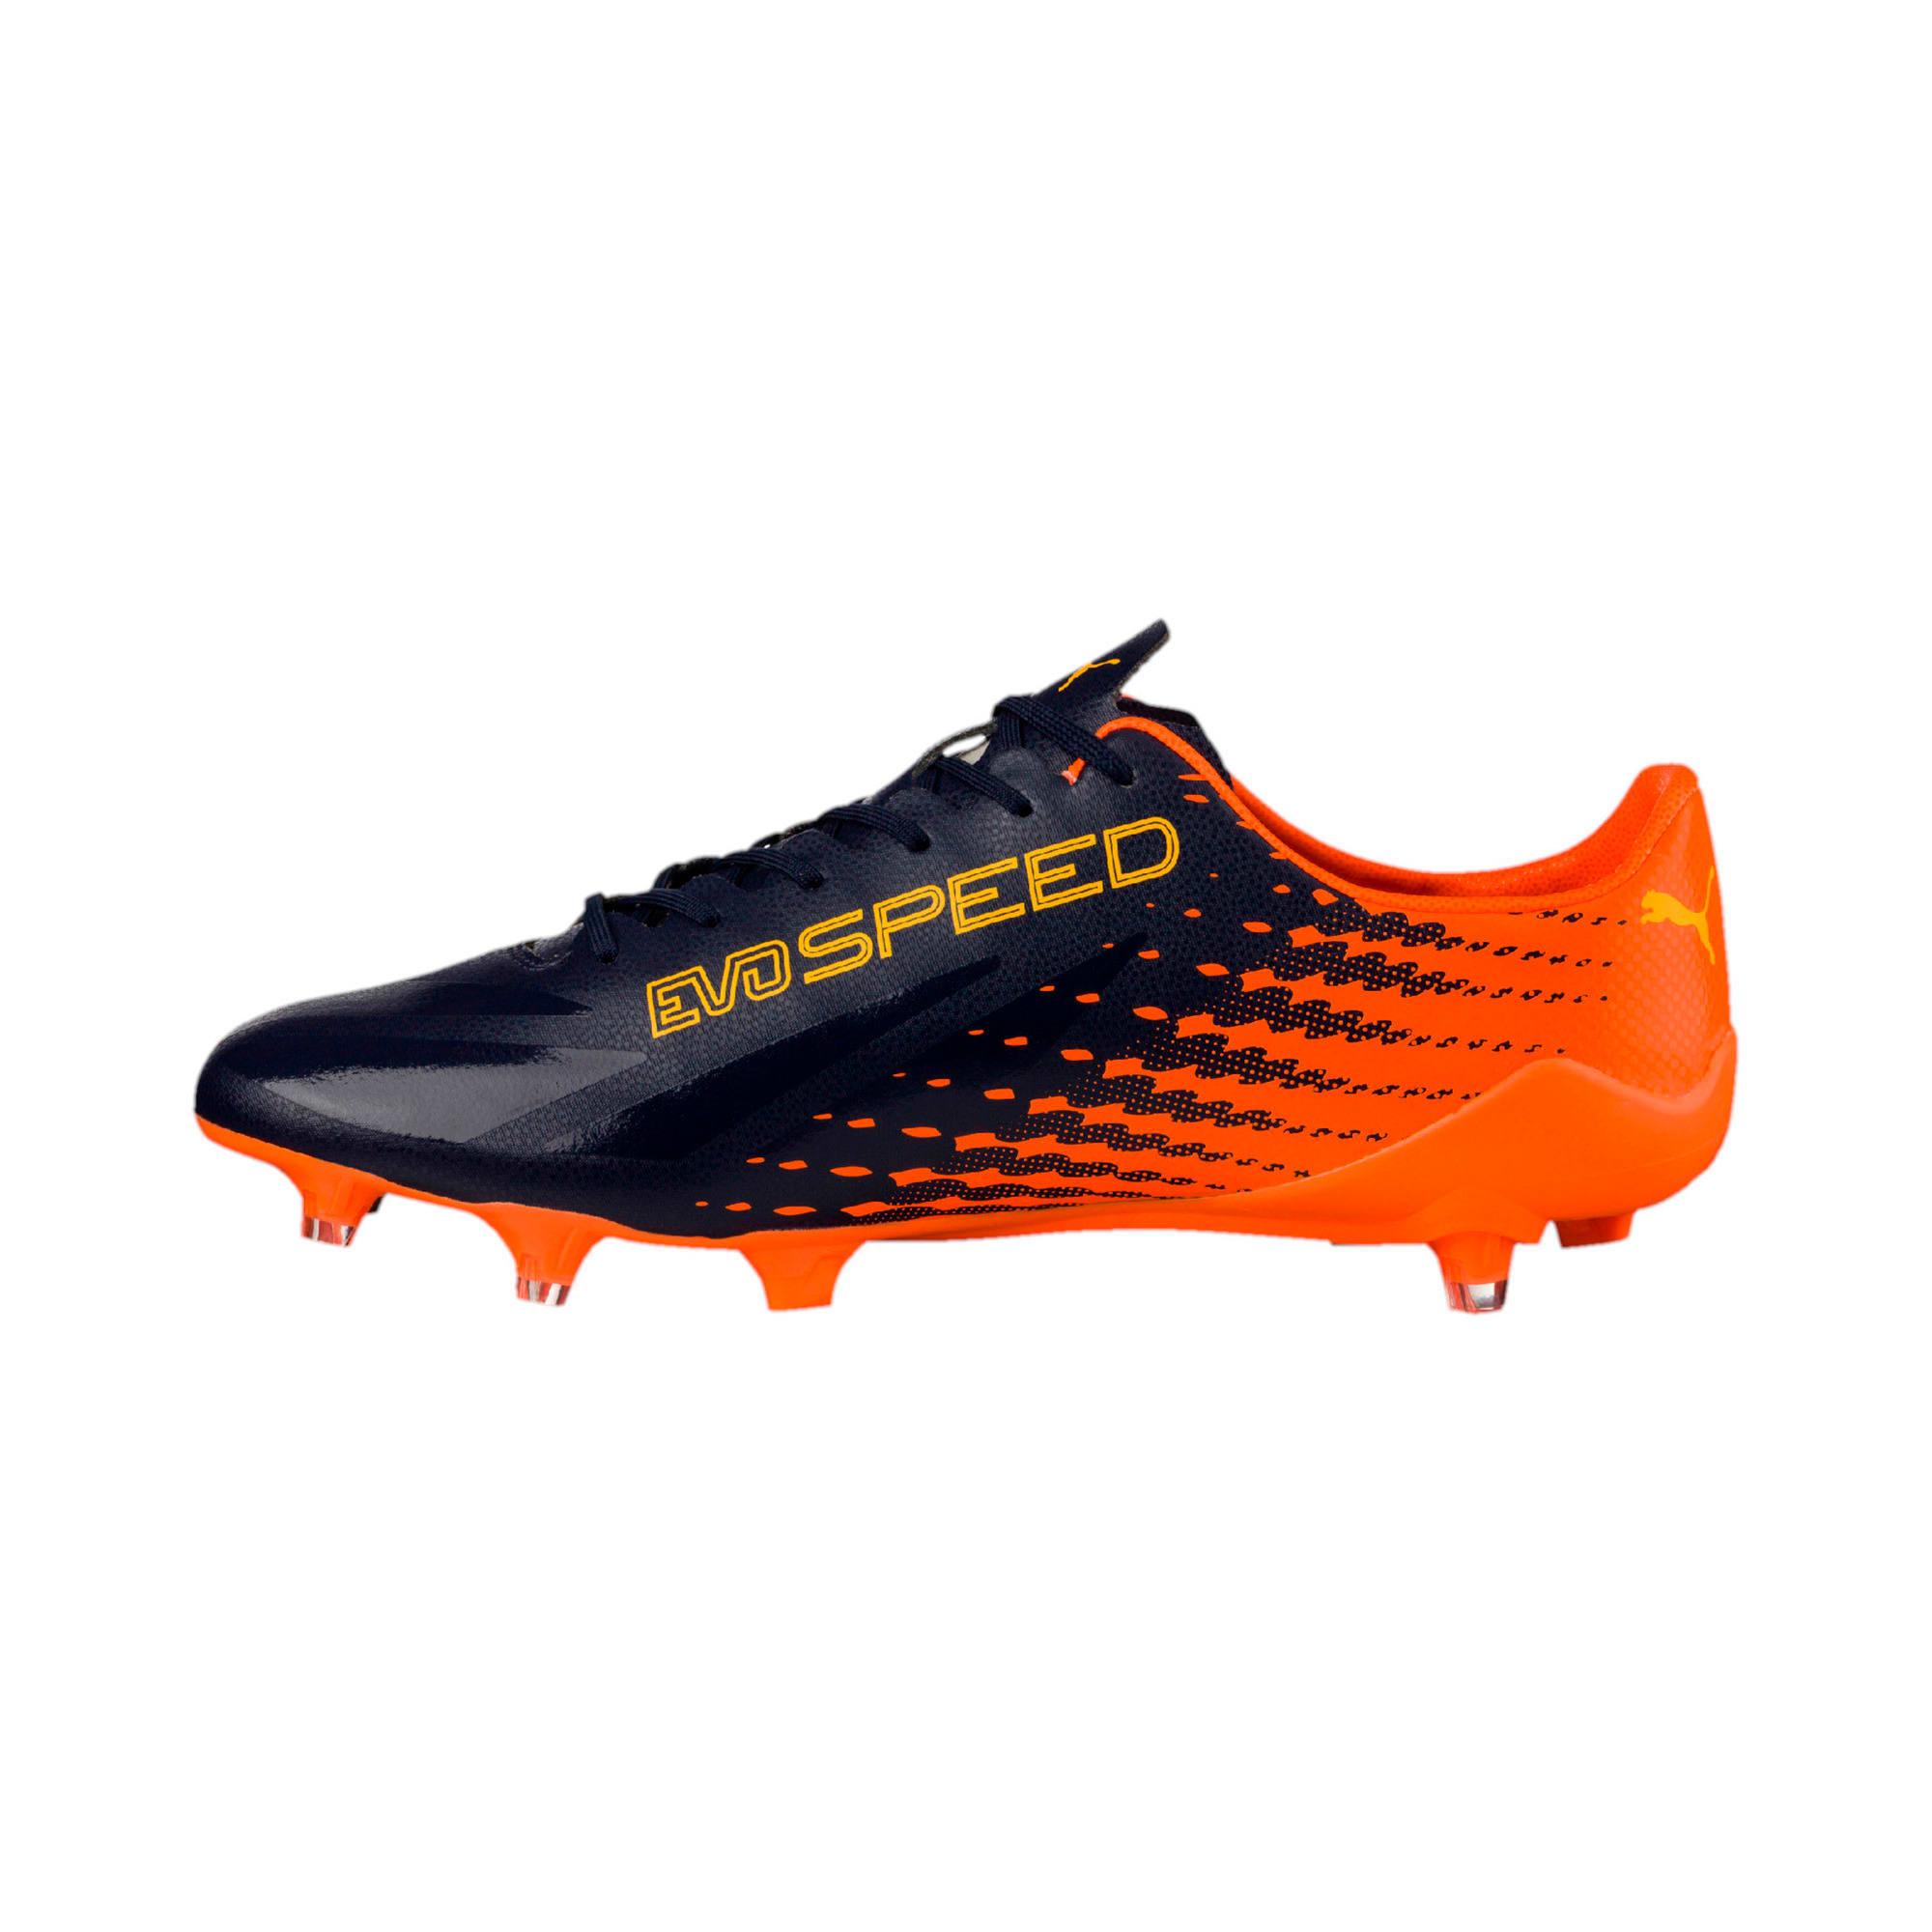 Thumbnail 1 of evoSPEED 17 SL-S FG Men's Football Boots, YELLOW-Peacoat-Orange, medium-IND